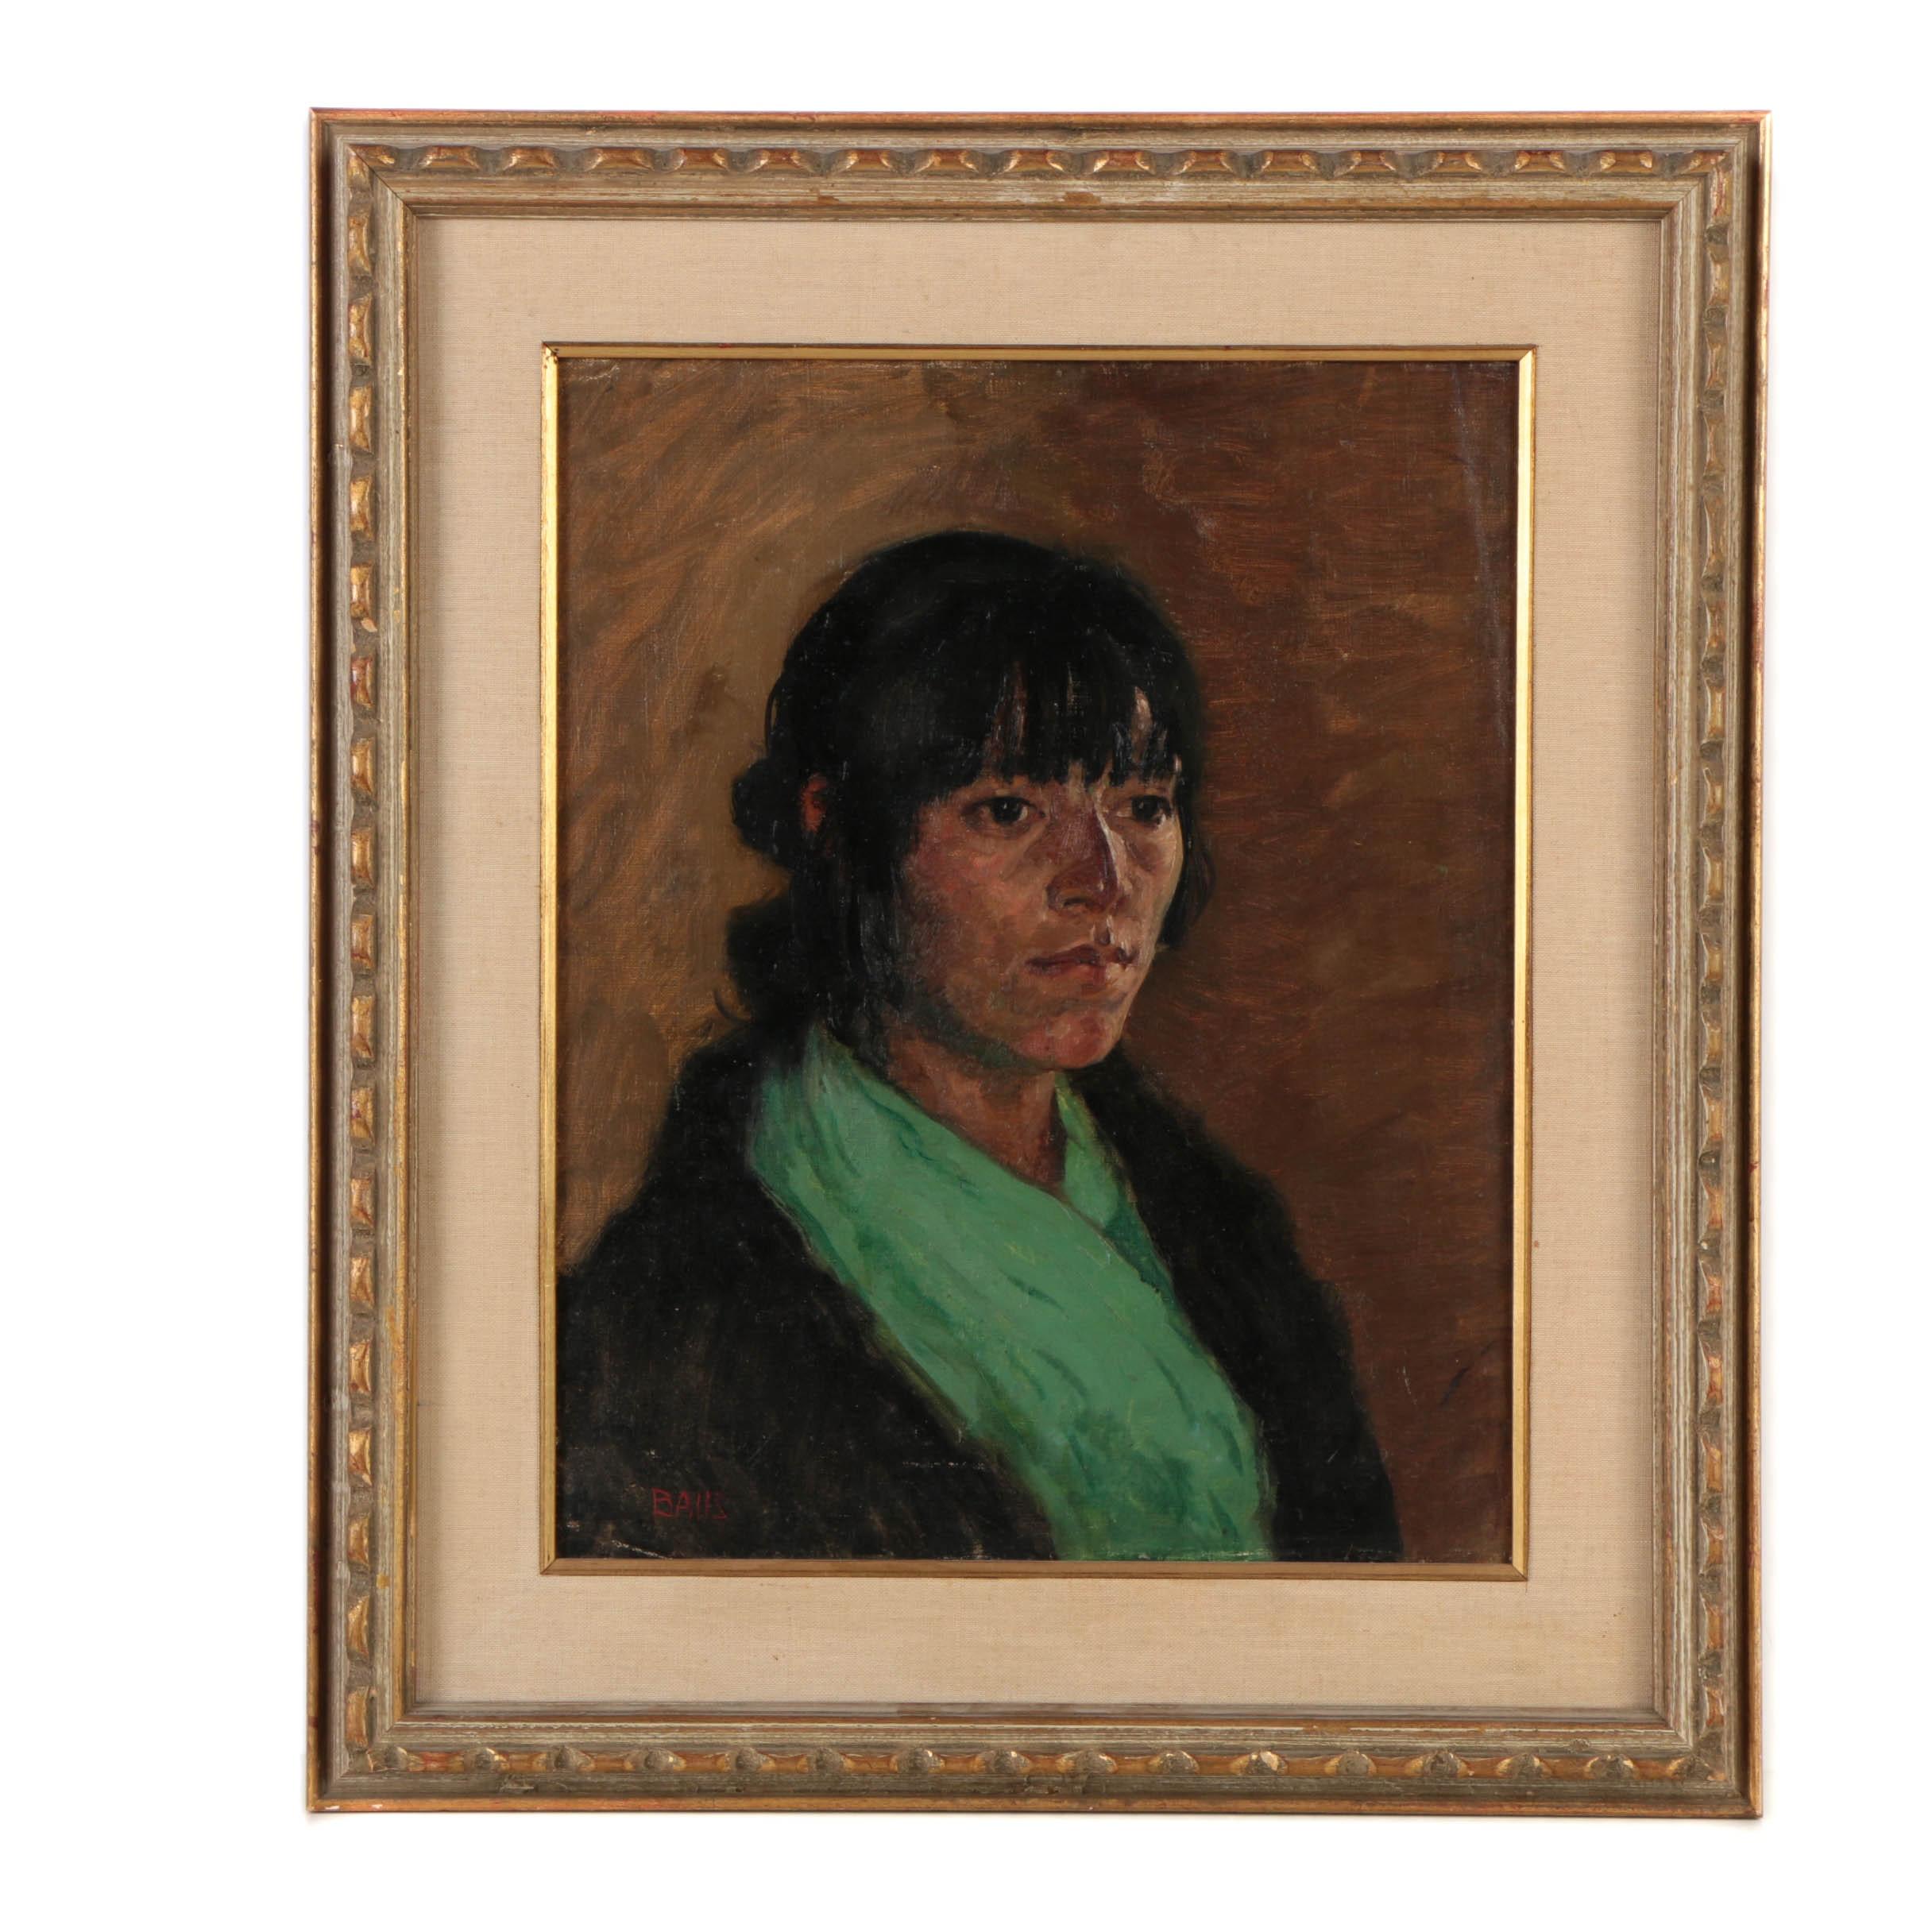 Rare Southwestern Portrait of a Native American by Simon Baus